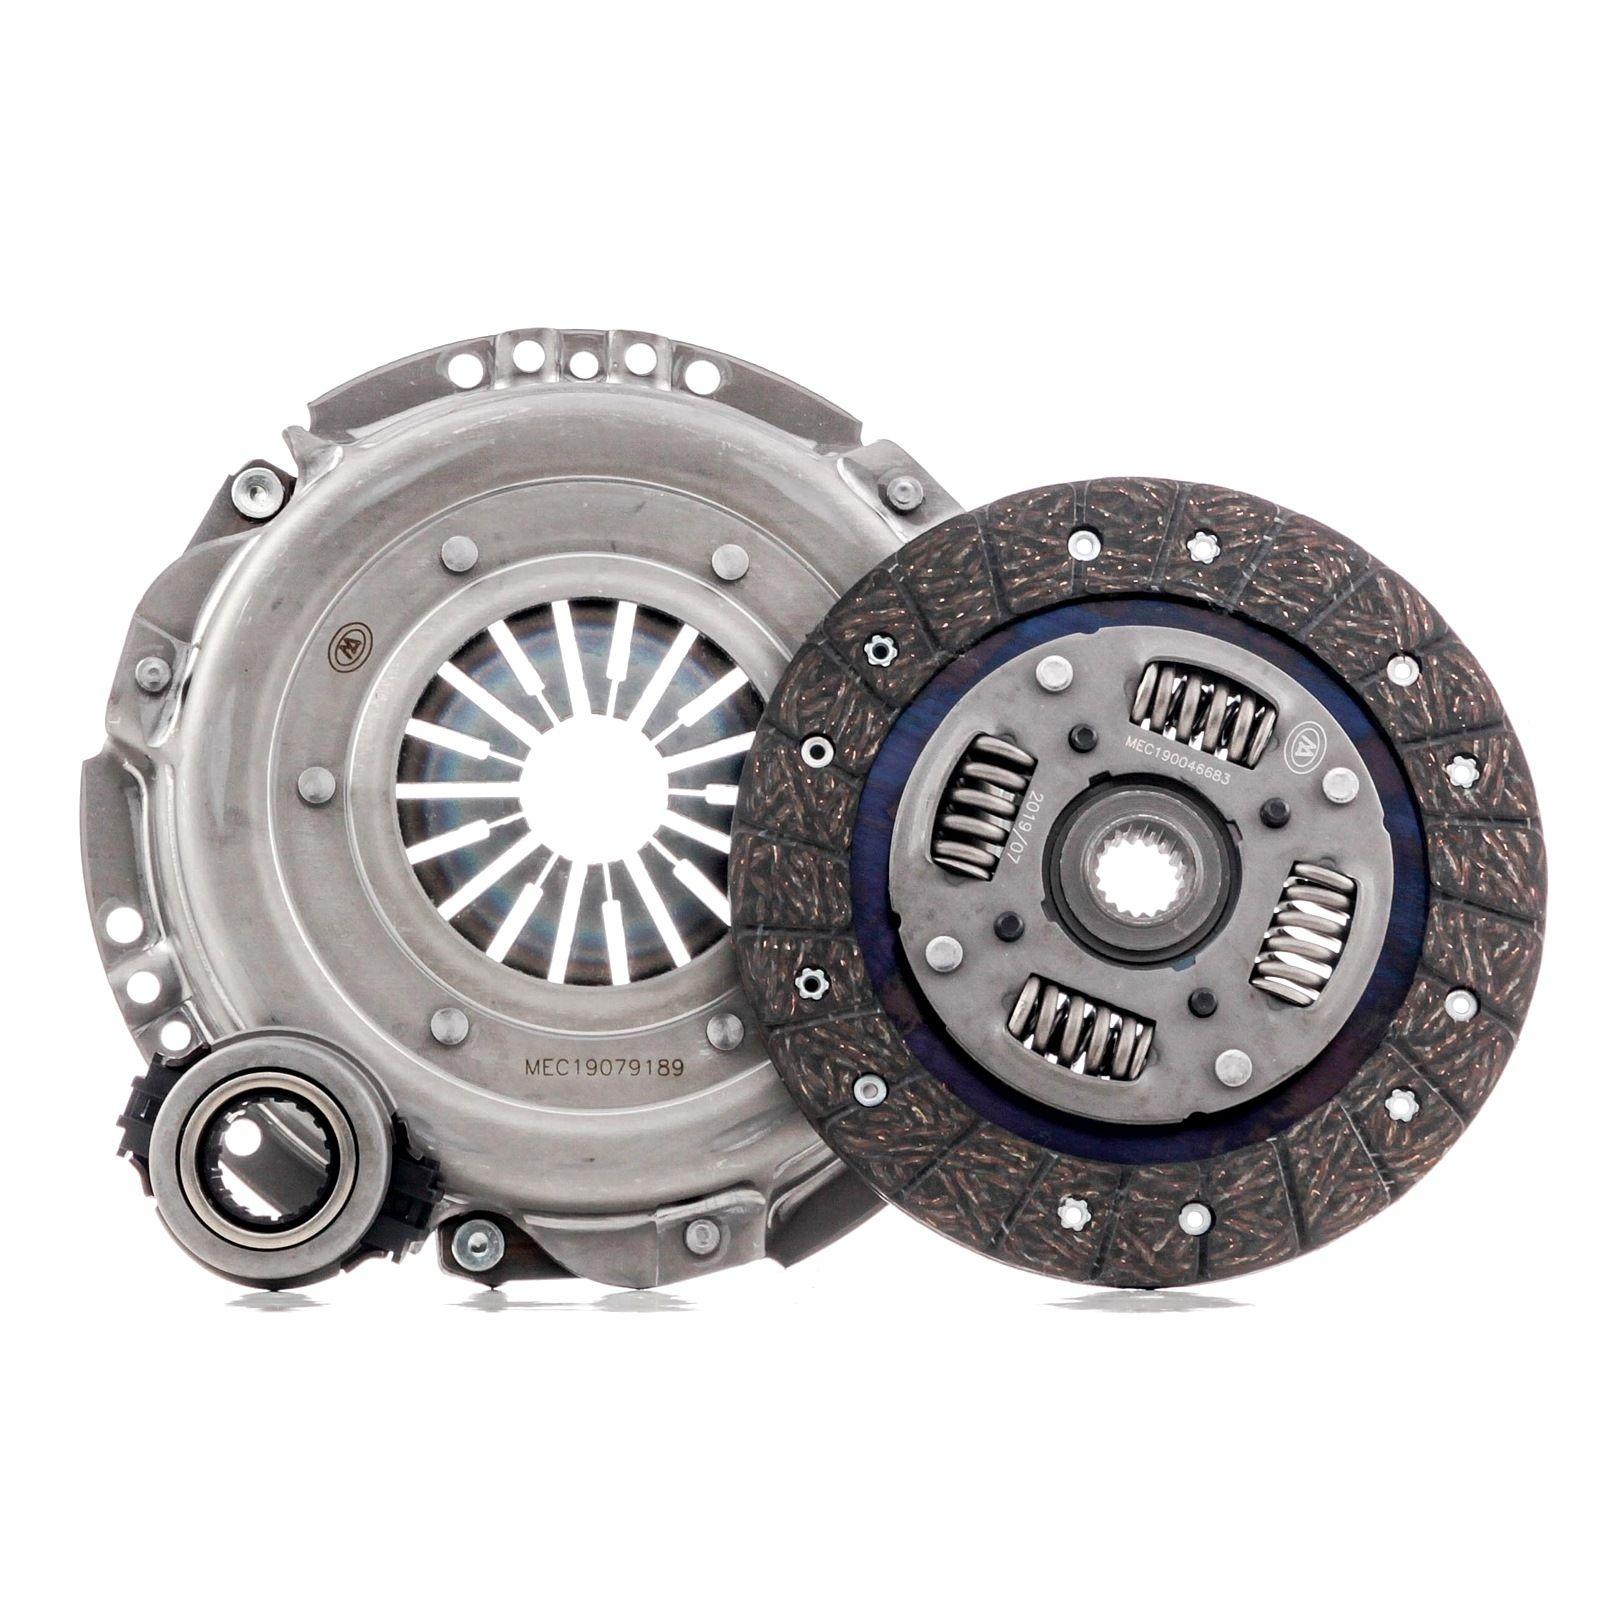 Clutch set MK9280 MECARM — only new parts